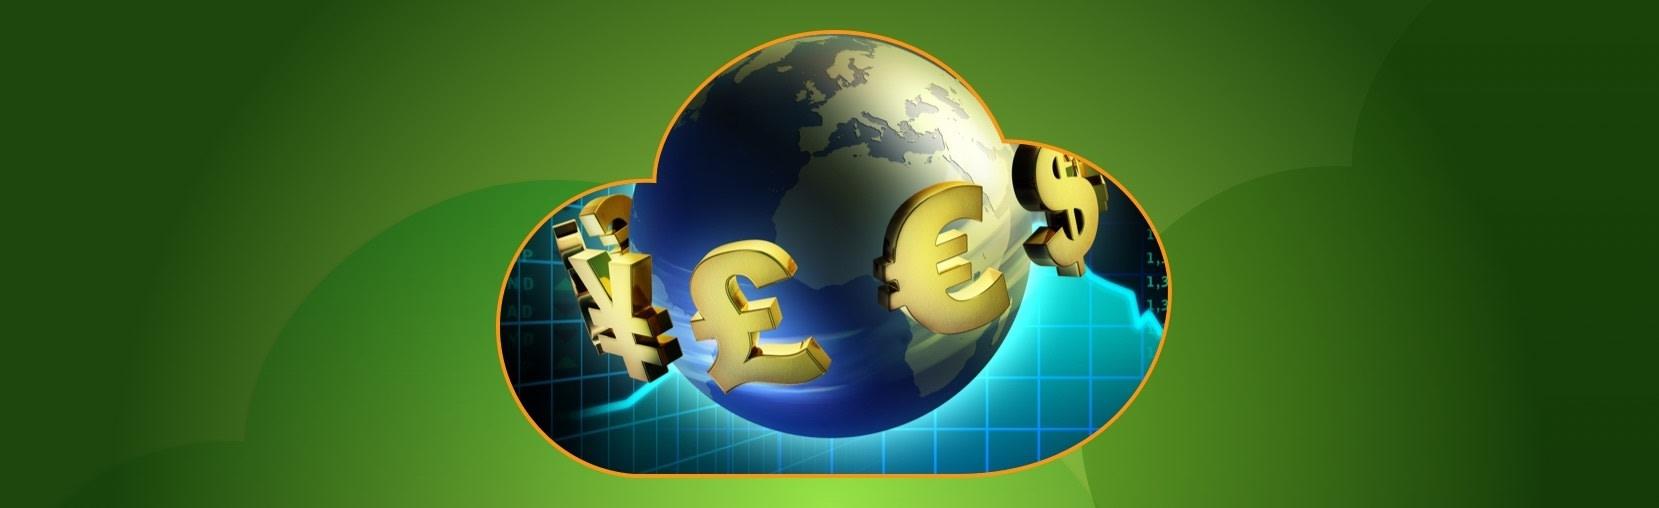 Cloudbet's fiat money review contest winners